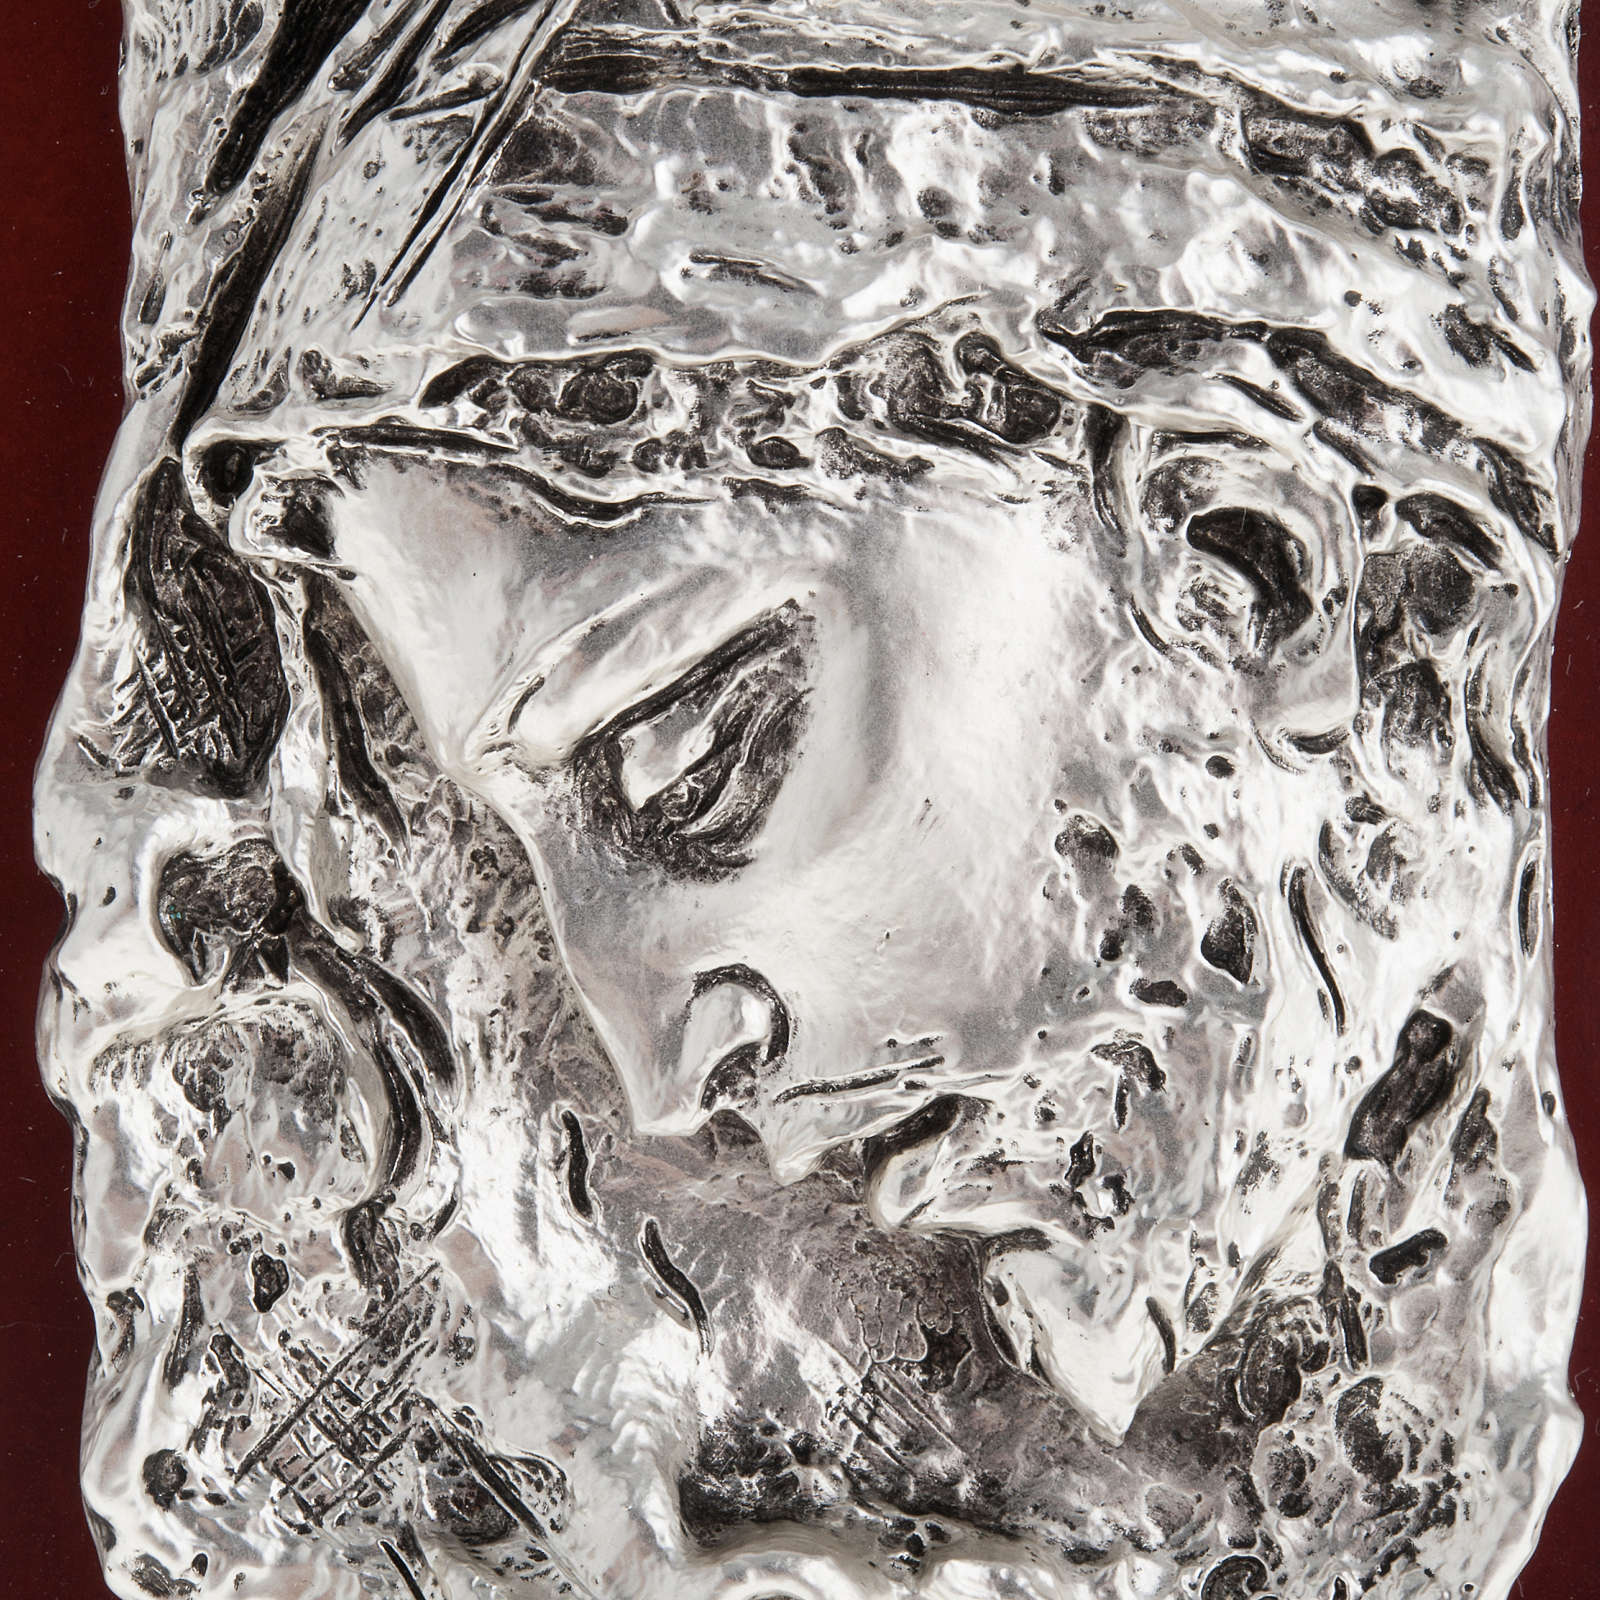 Basrelieffigur Gesicht Christi, silberweisses Metall 4